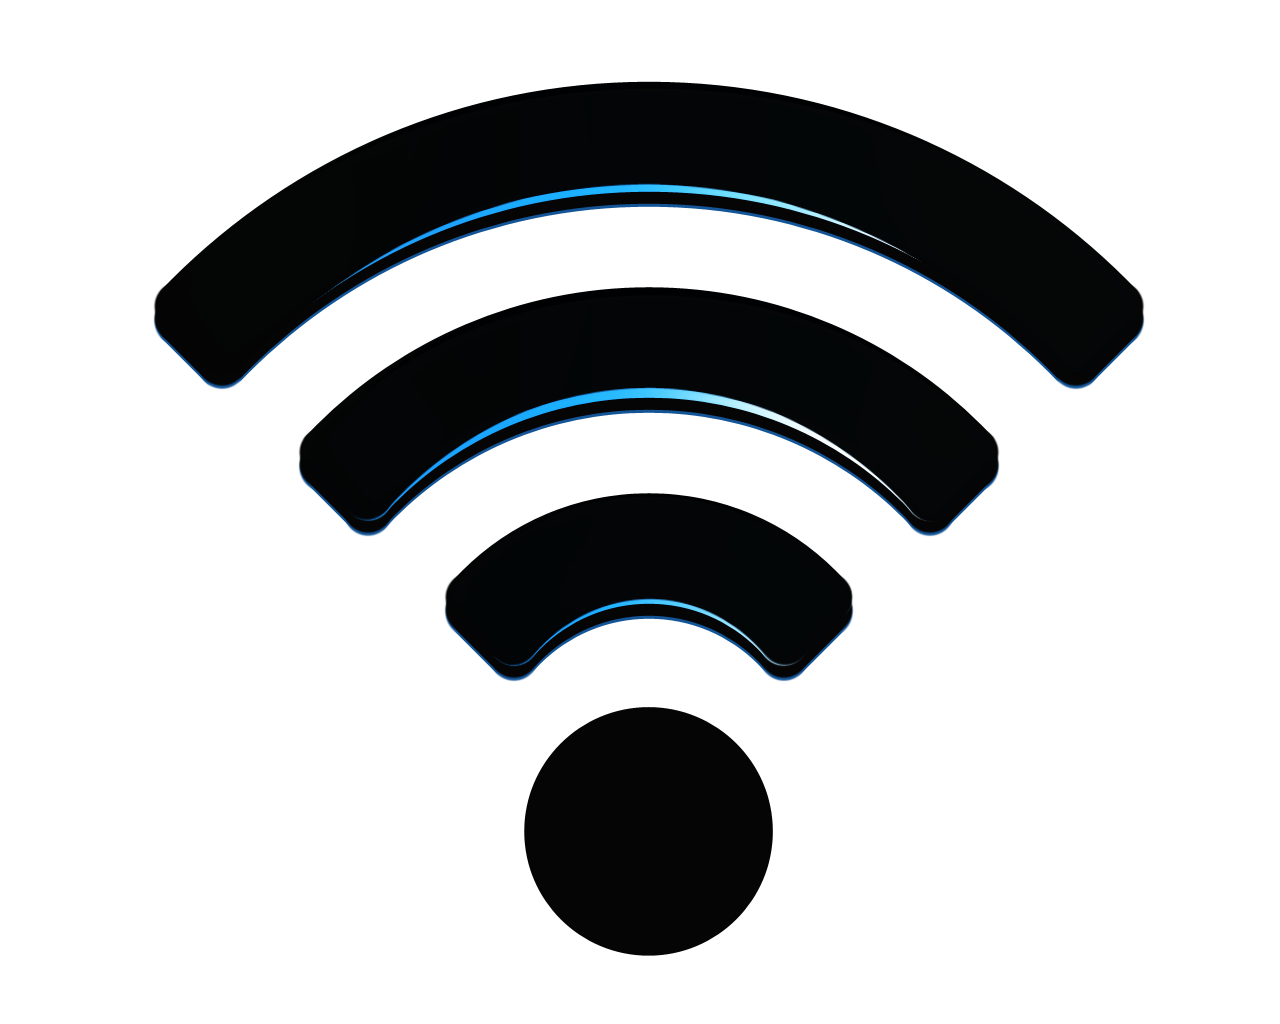 File:Wireless.